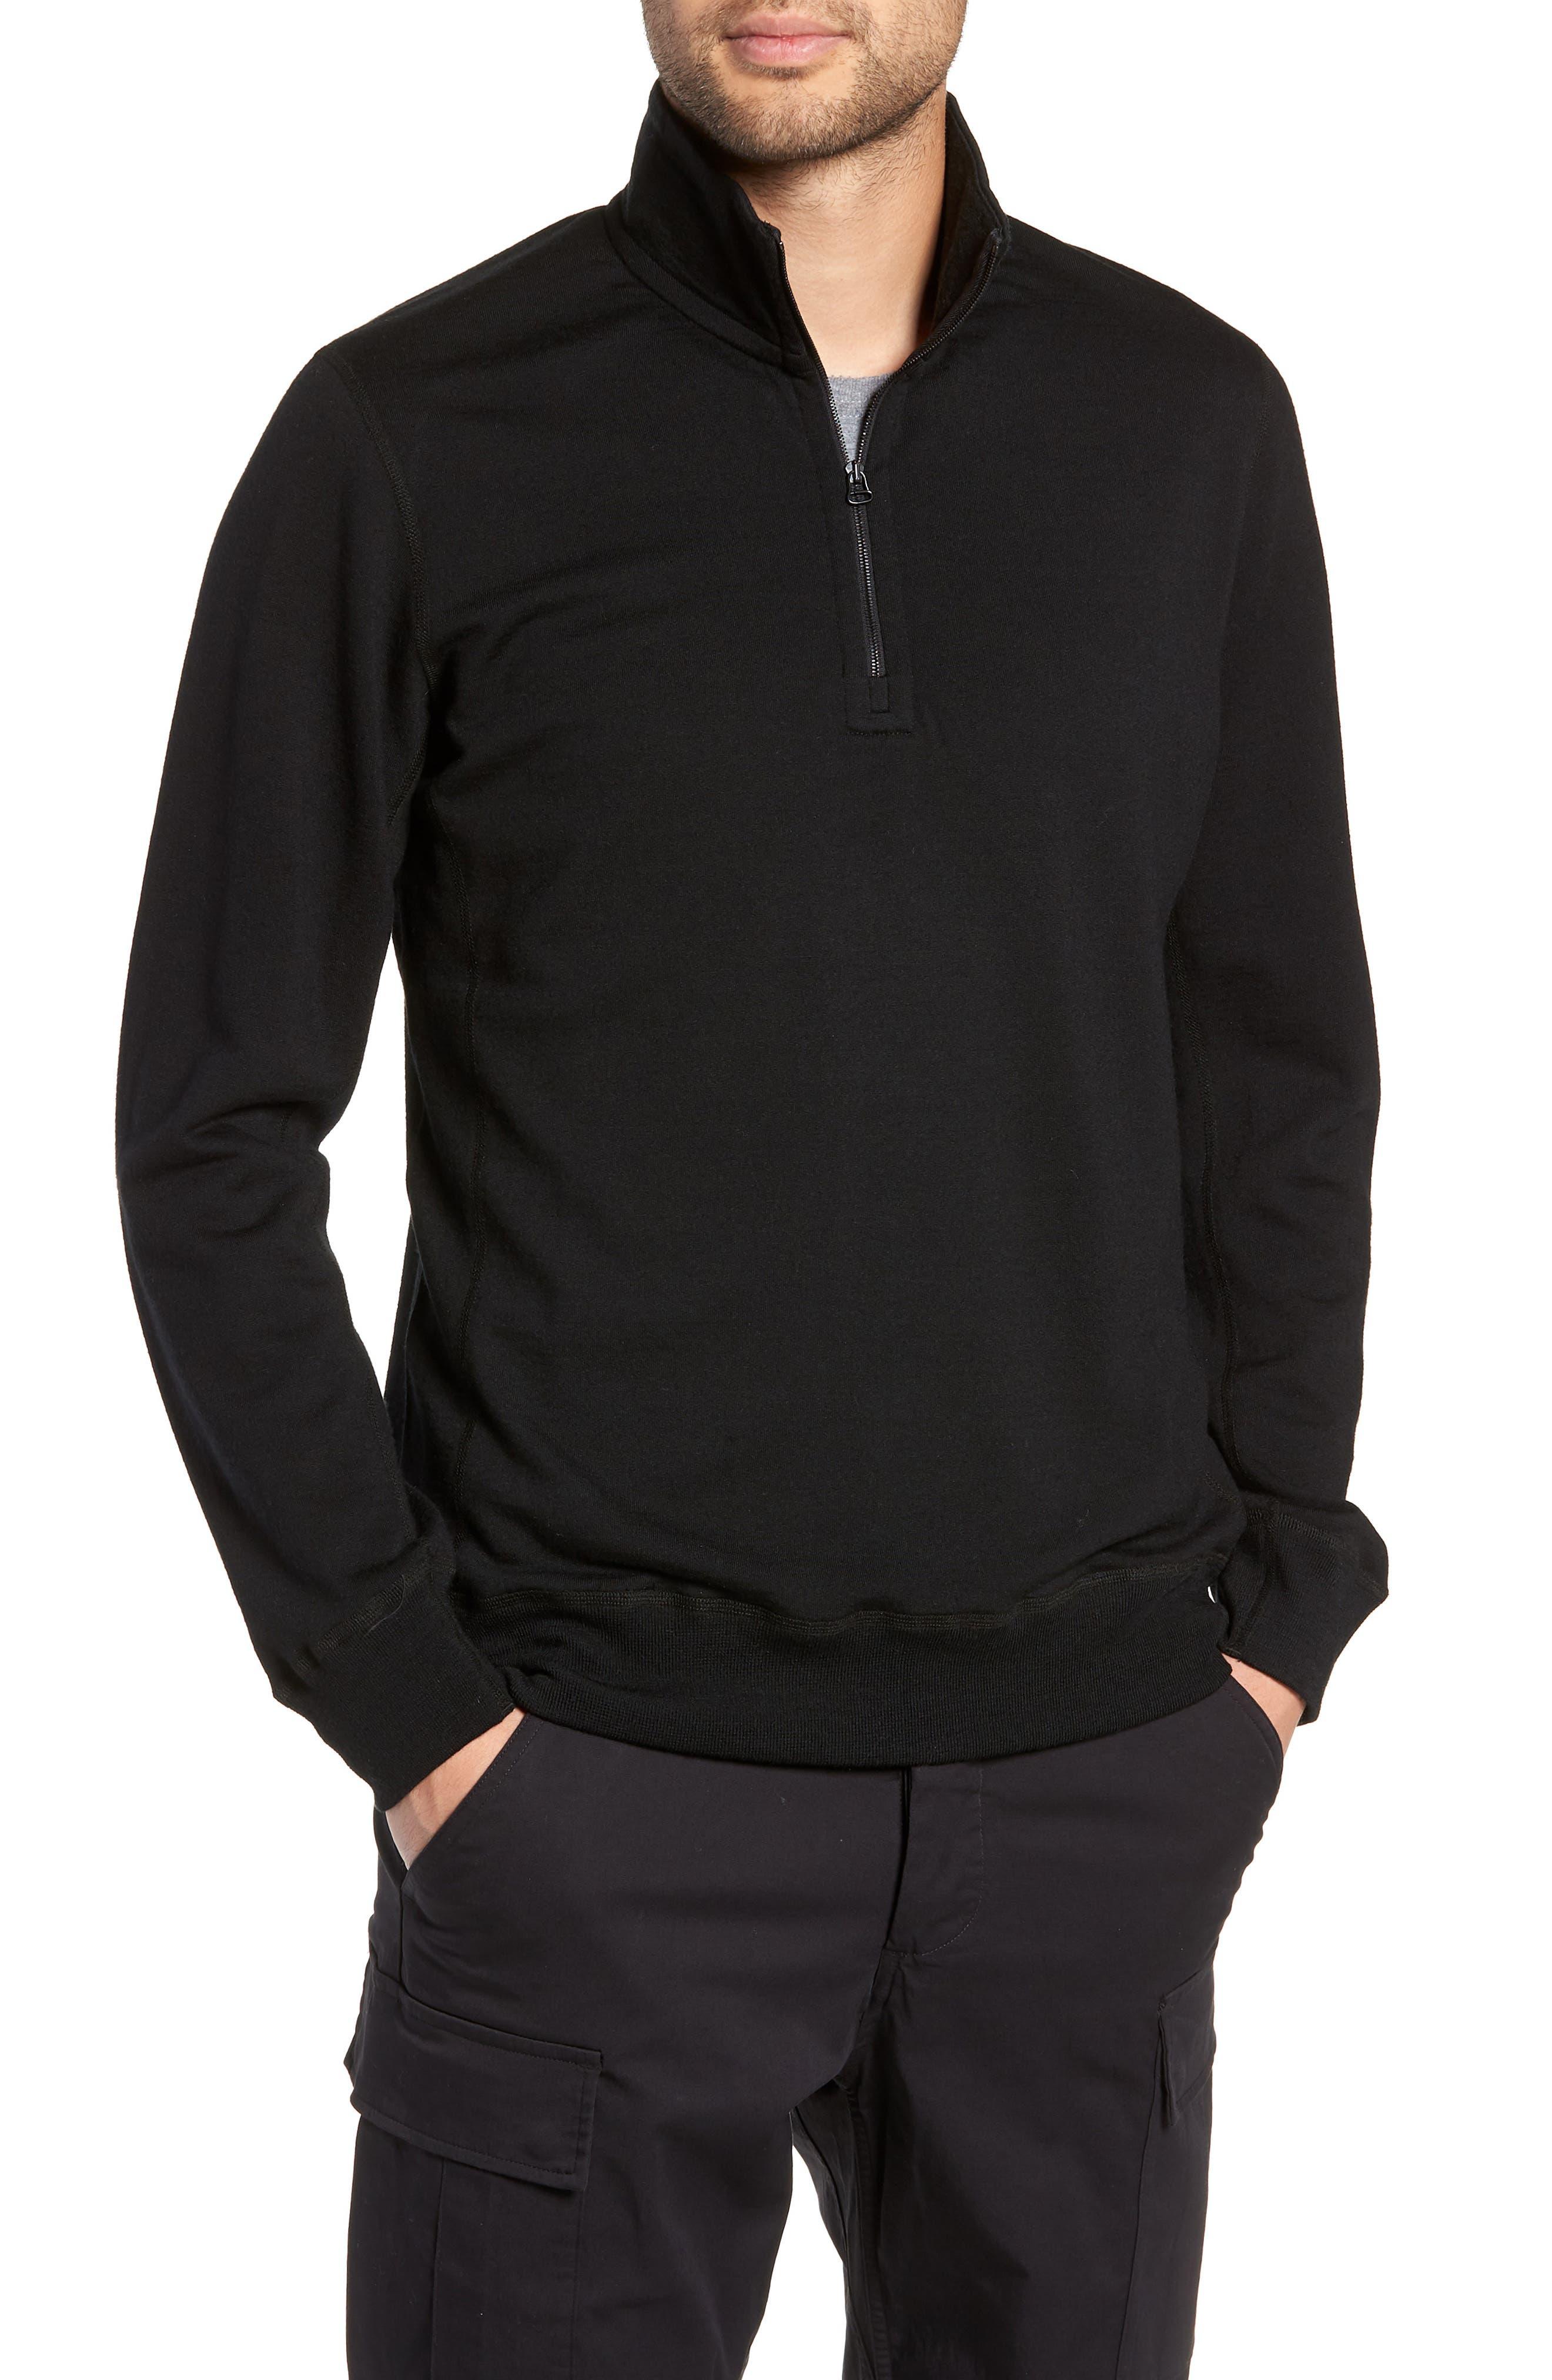 Swedish Merino Wool Trail Shirt,                         Main,                         color, BLACK